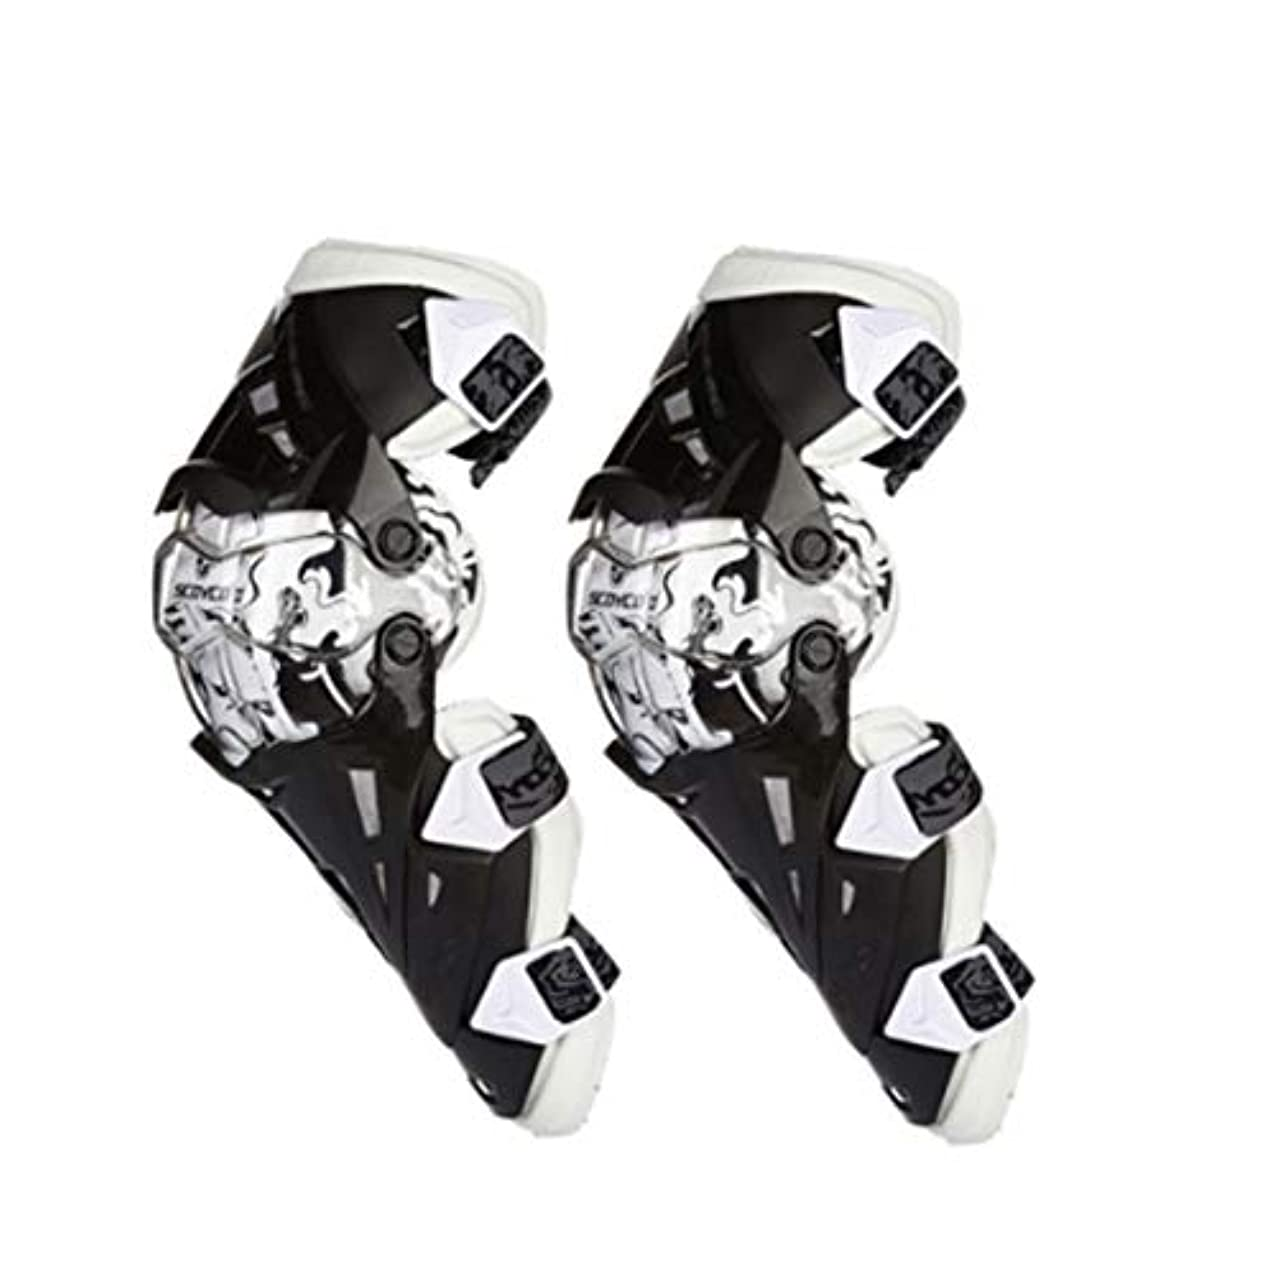 FELICIAAA 膝パッド、調整可能なロングレッグスリーブギアクラッシュプルーフアンチスリップオートバイマウンテンバイク1ペアのための保護警備員 (色 : ホワイト)